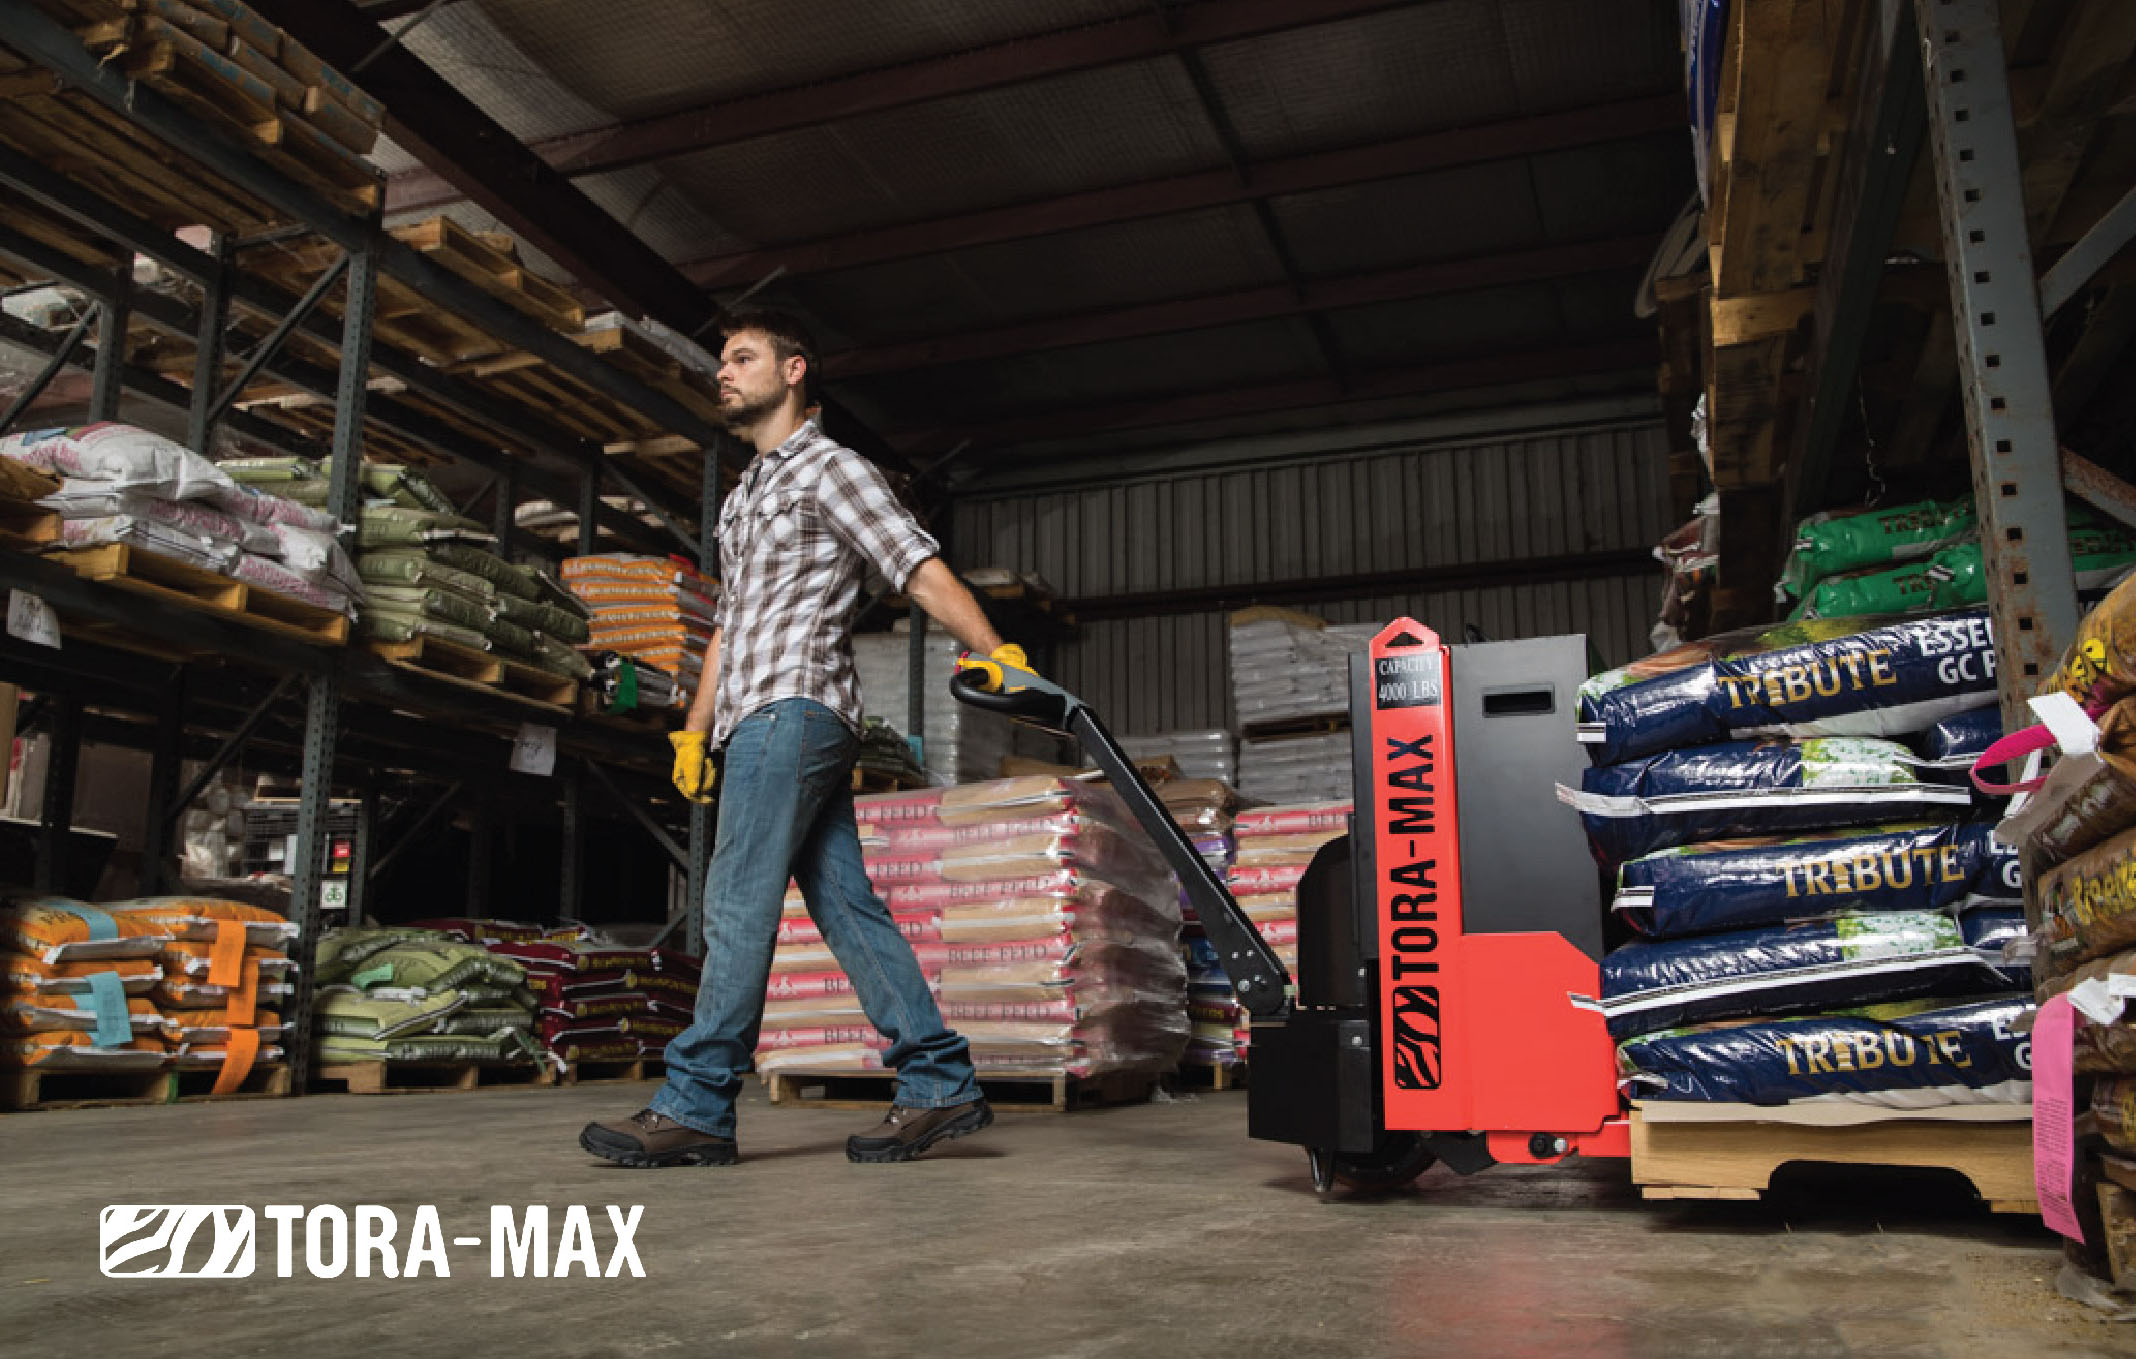 Tora-Max Sales Event